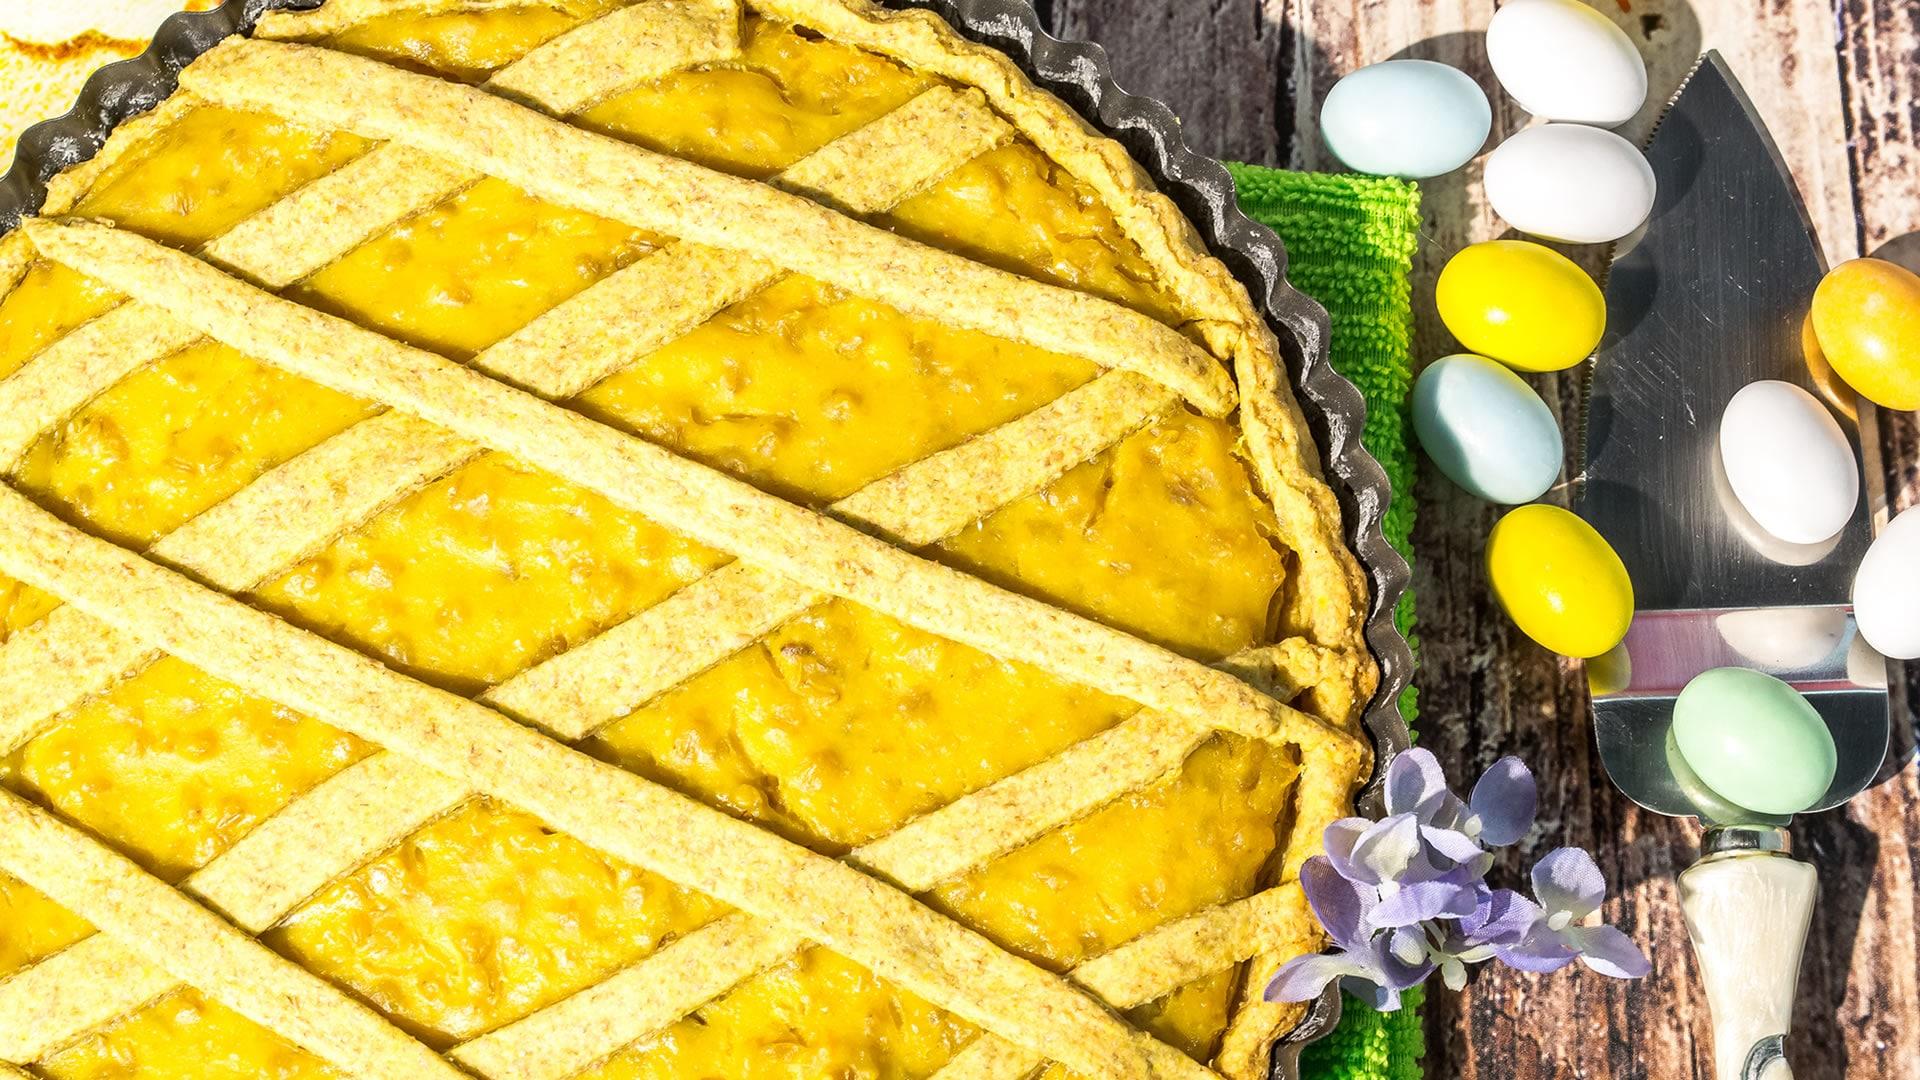 Foto Pastiera Vegana - Crostata Pasquale Senza Burro, Latte e Uova